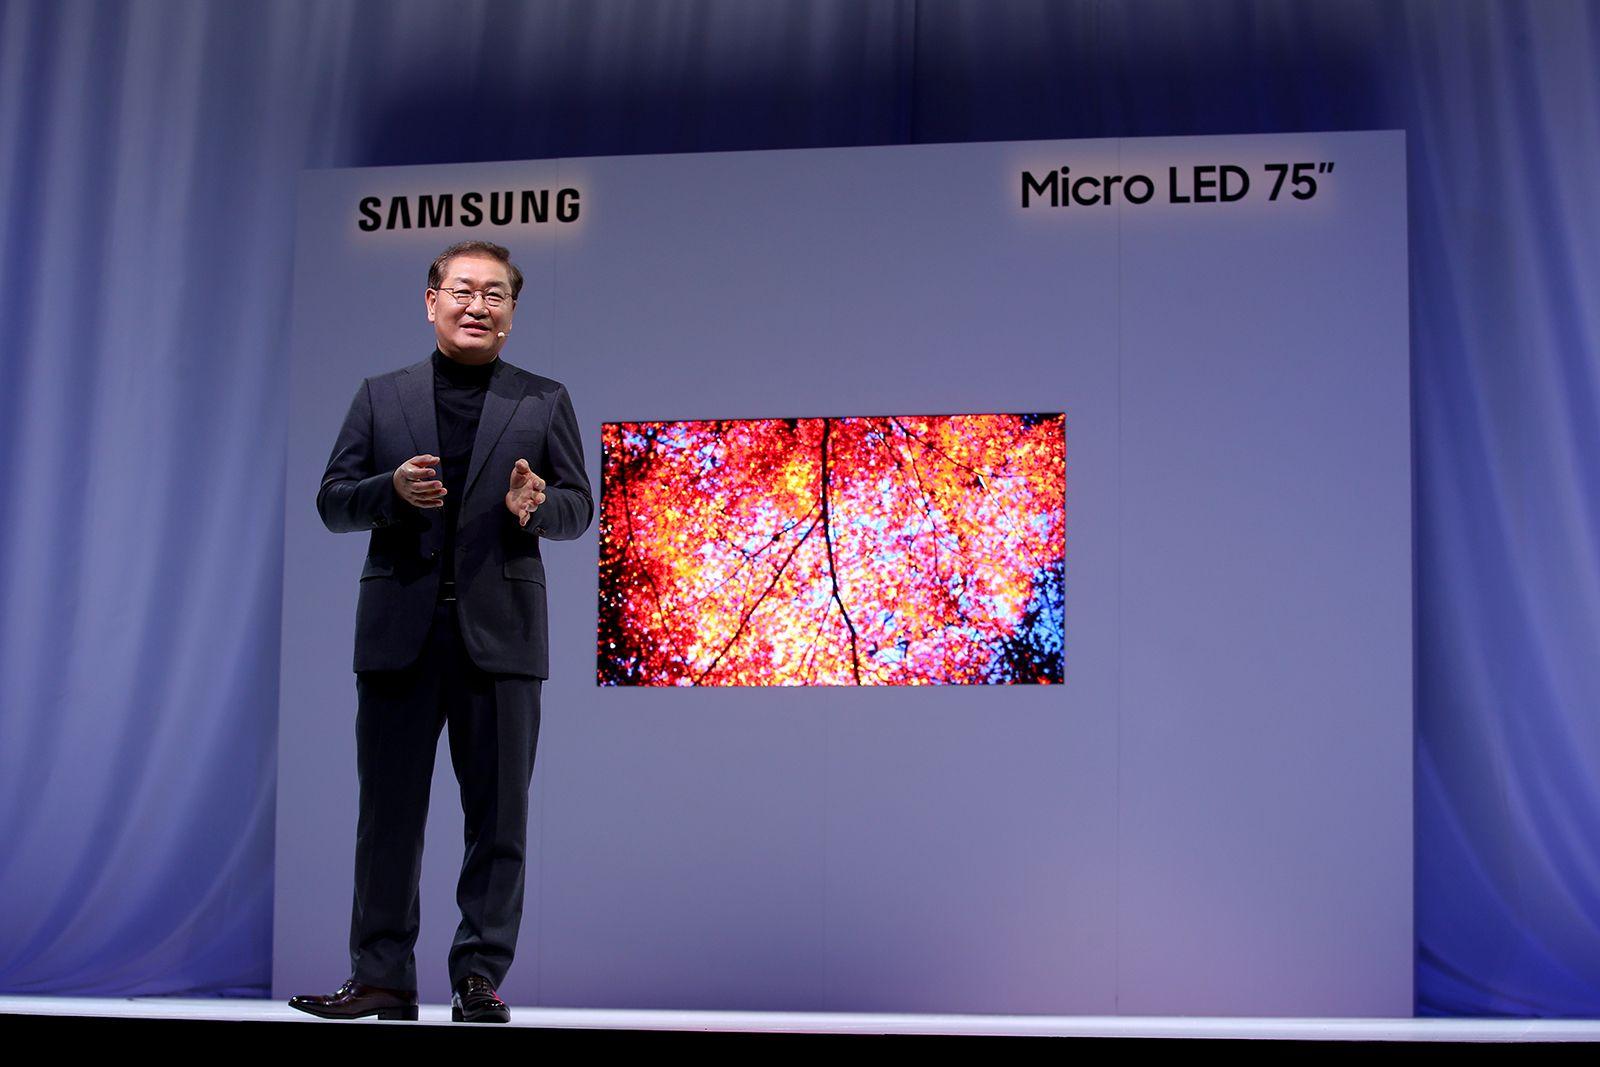 Samsung micro led ces 2019